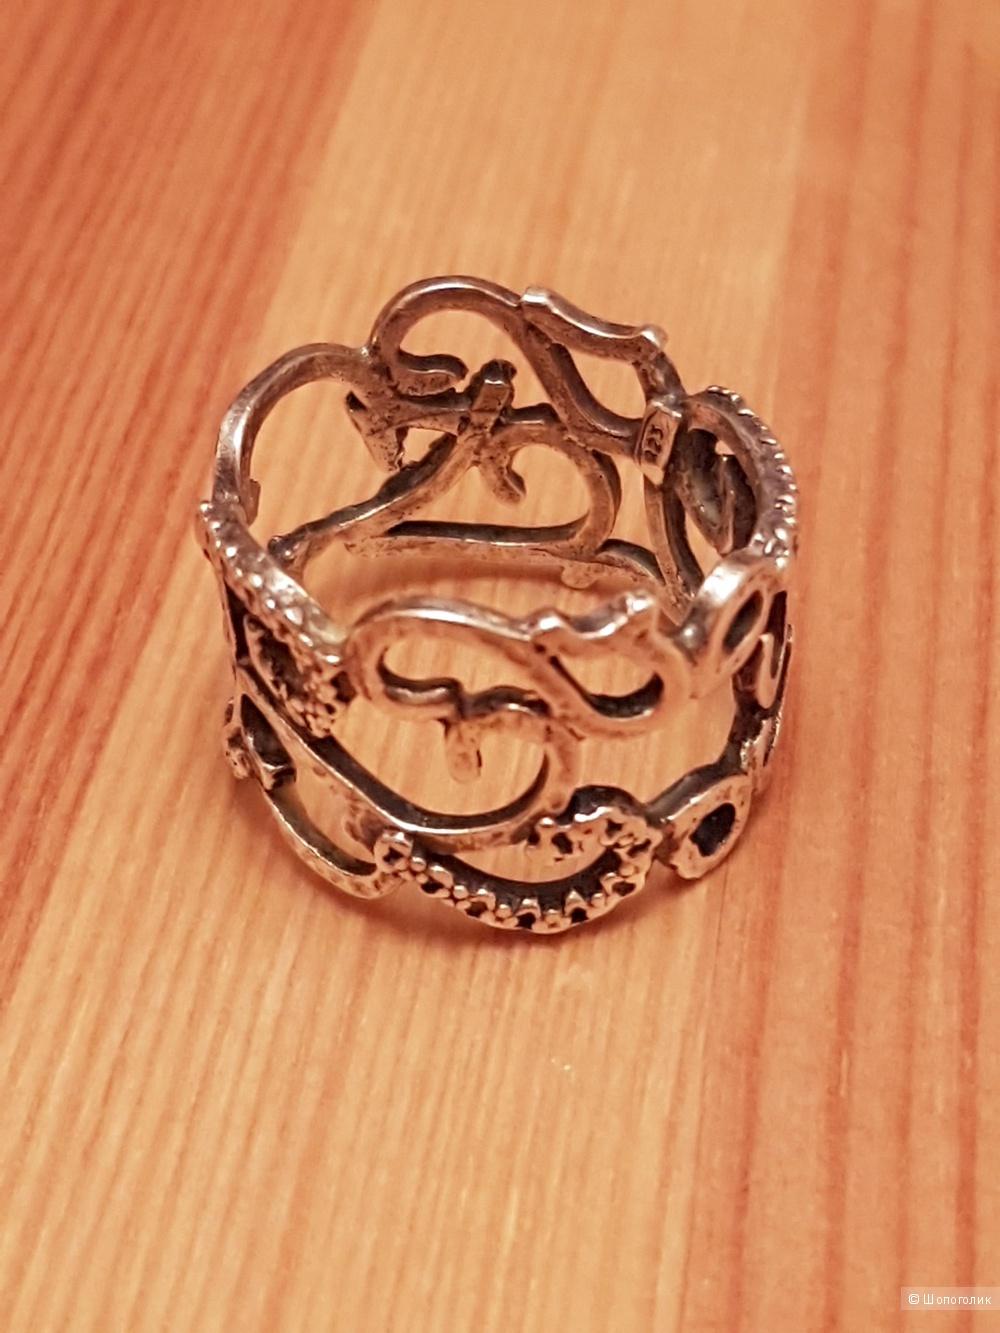 Кольцо серебряное  TAMIR ZUMAN,  размер 16,5